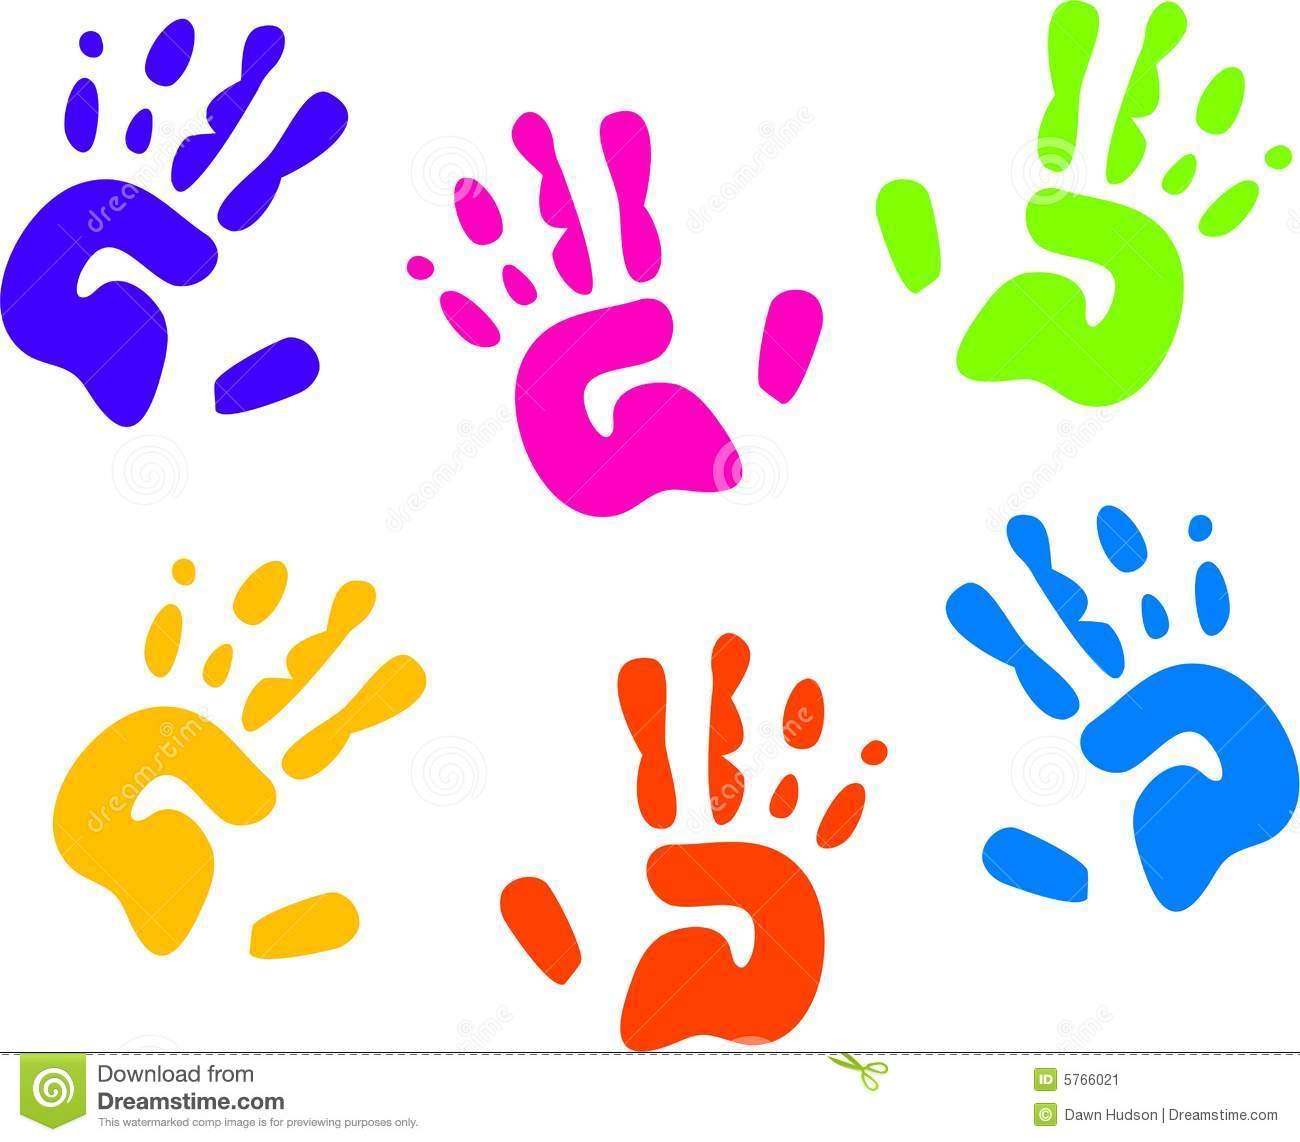 kids handprint clipart clipart panda free clipart images rh clipartpanda com Colorful Handprint Clip Art Colorful Handprint Clip Art